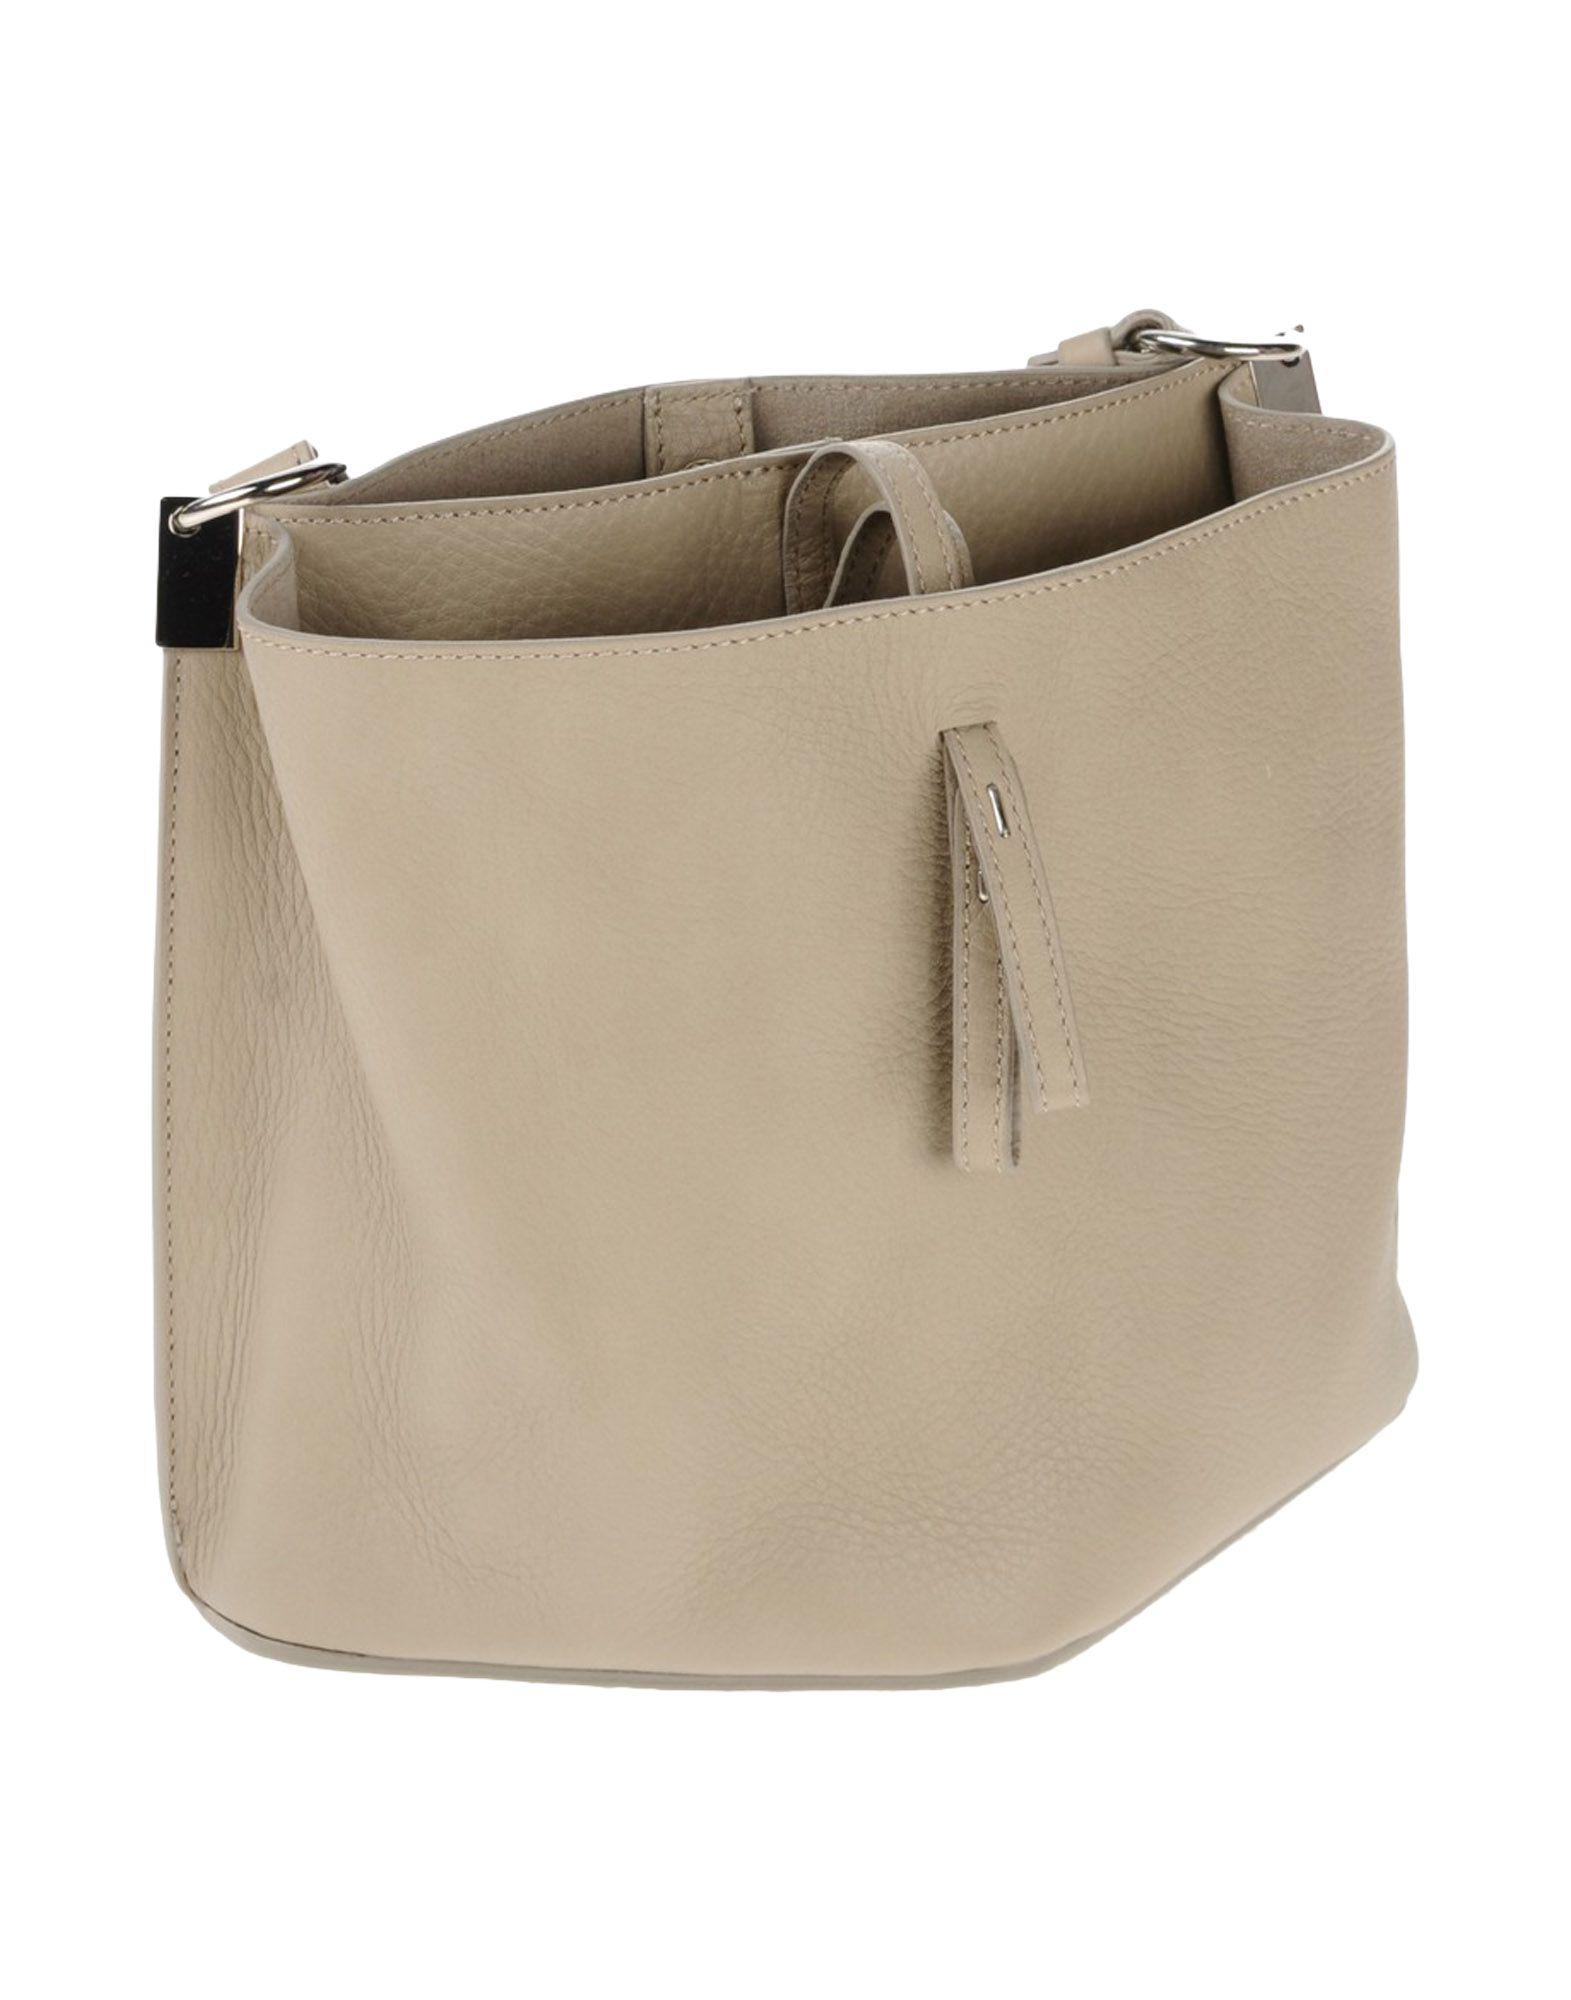 Maison Margiela Leather Cross-body Bag in Light Grey (Grey)